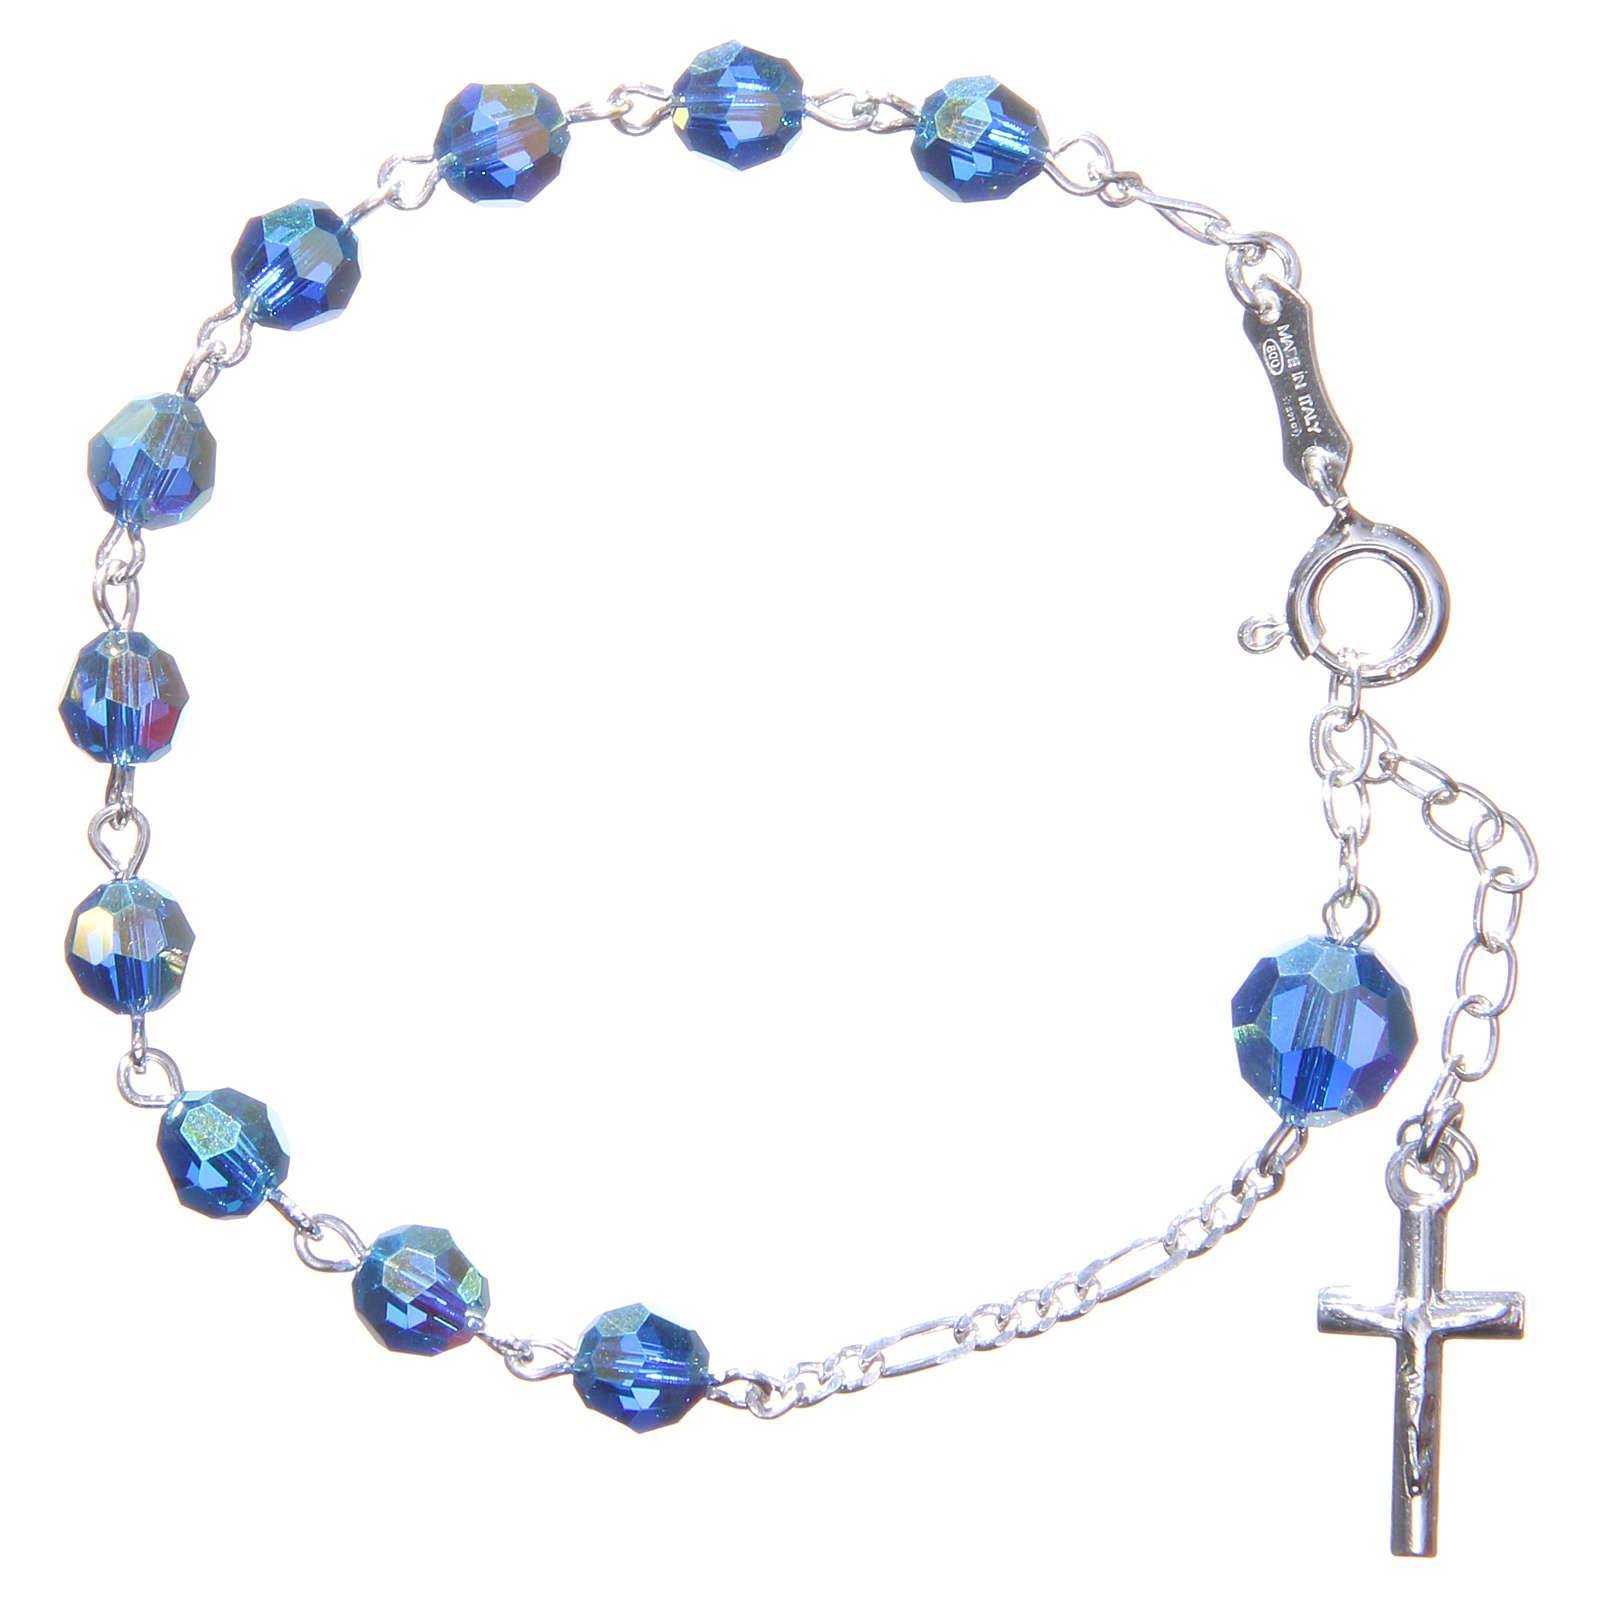 Rosary bracelet with light blue Swarowski crystals 6mm 4